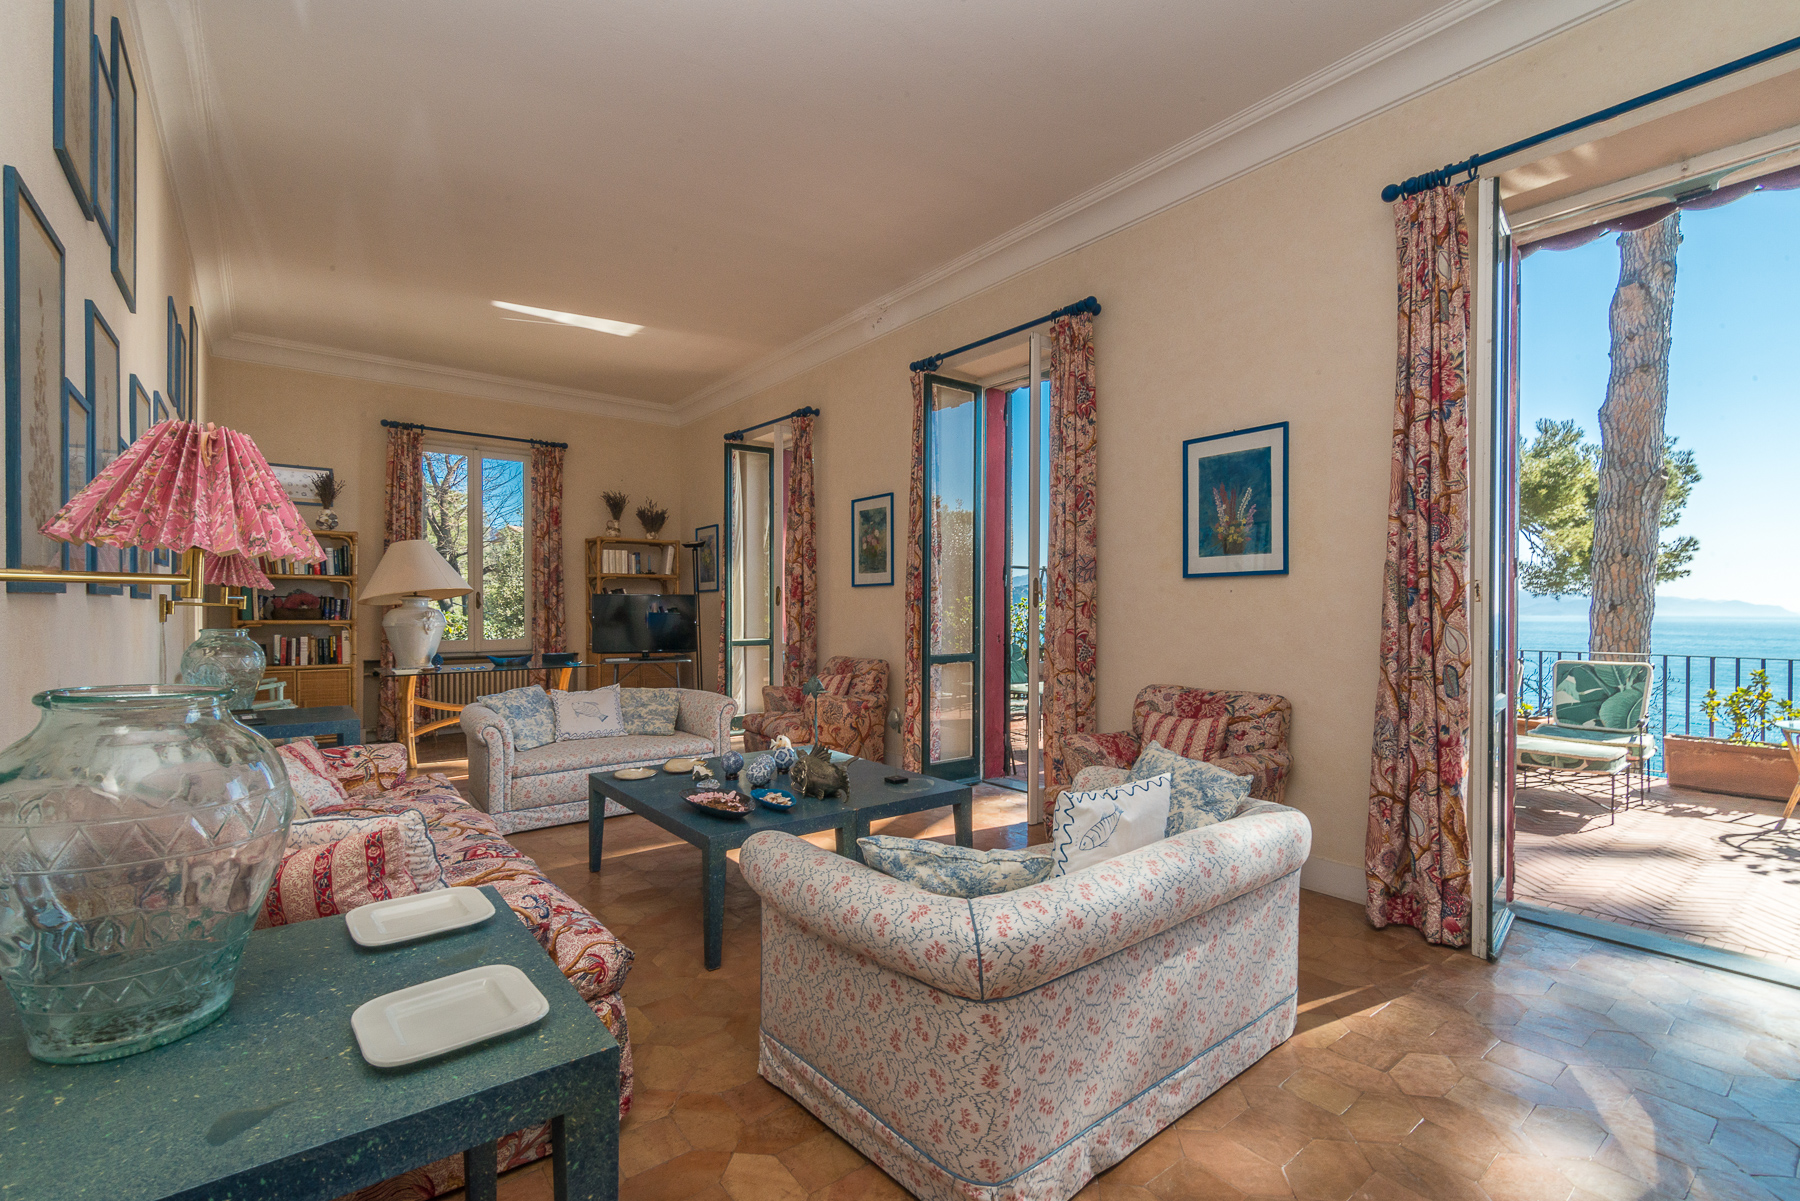 Villa in Vendita a Santa Margherita Ligure: 5 locali, 440 mq - Foto 29